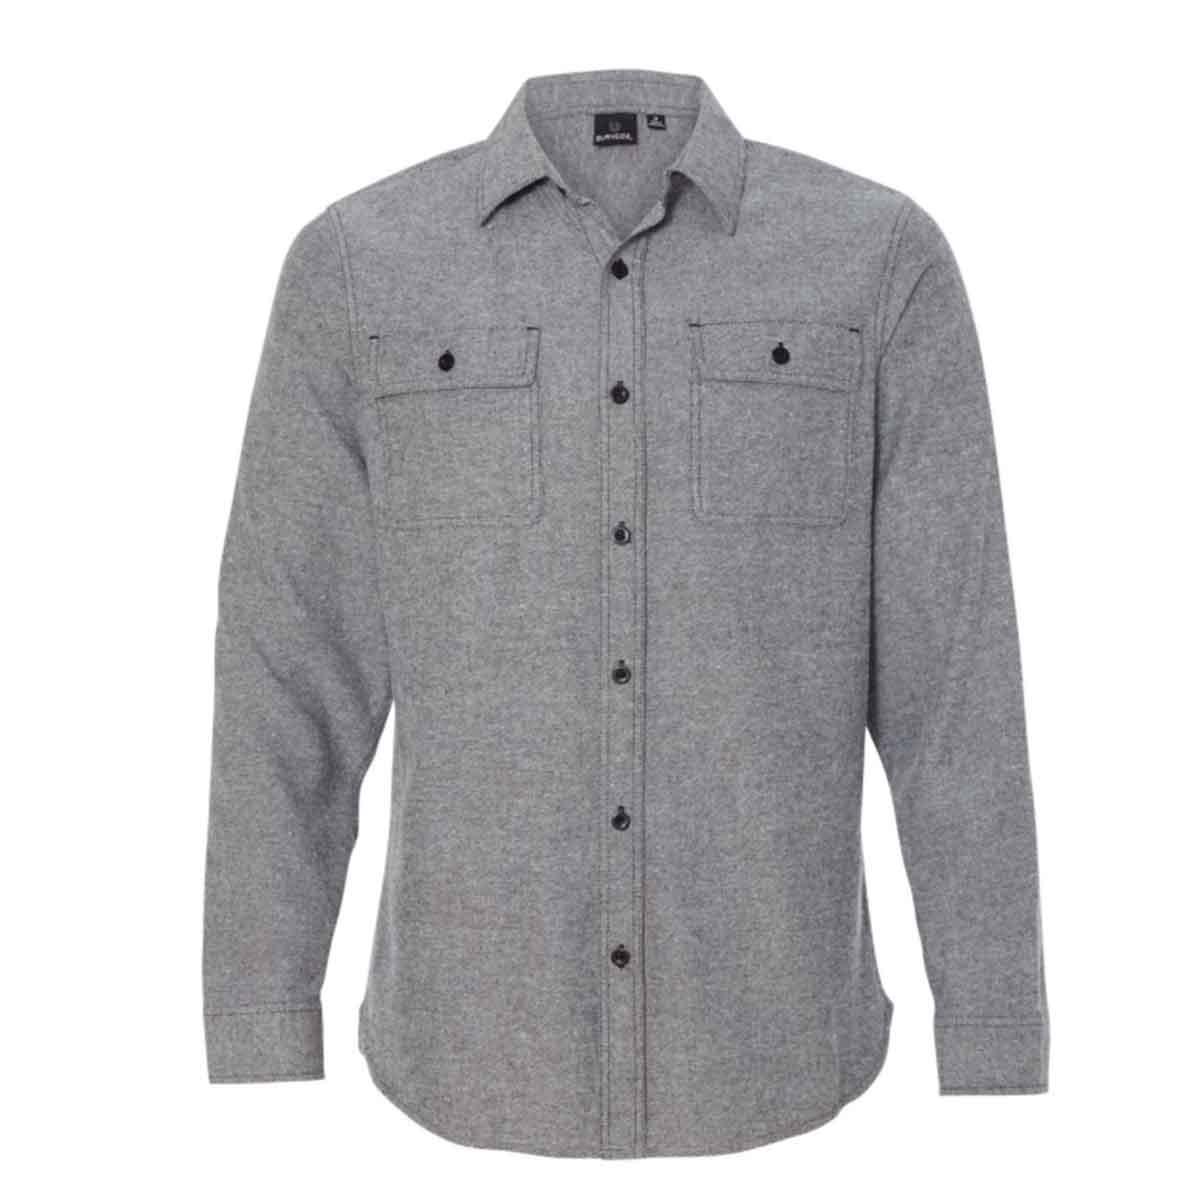 Ssactivewear longsleevefannelshirt heathergray